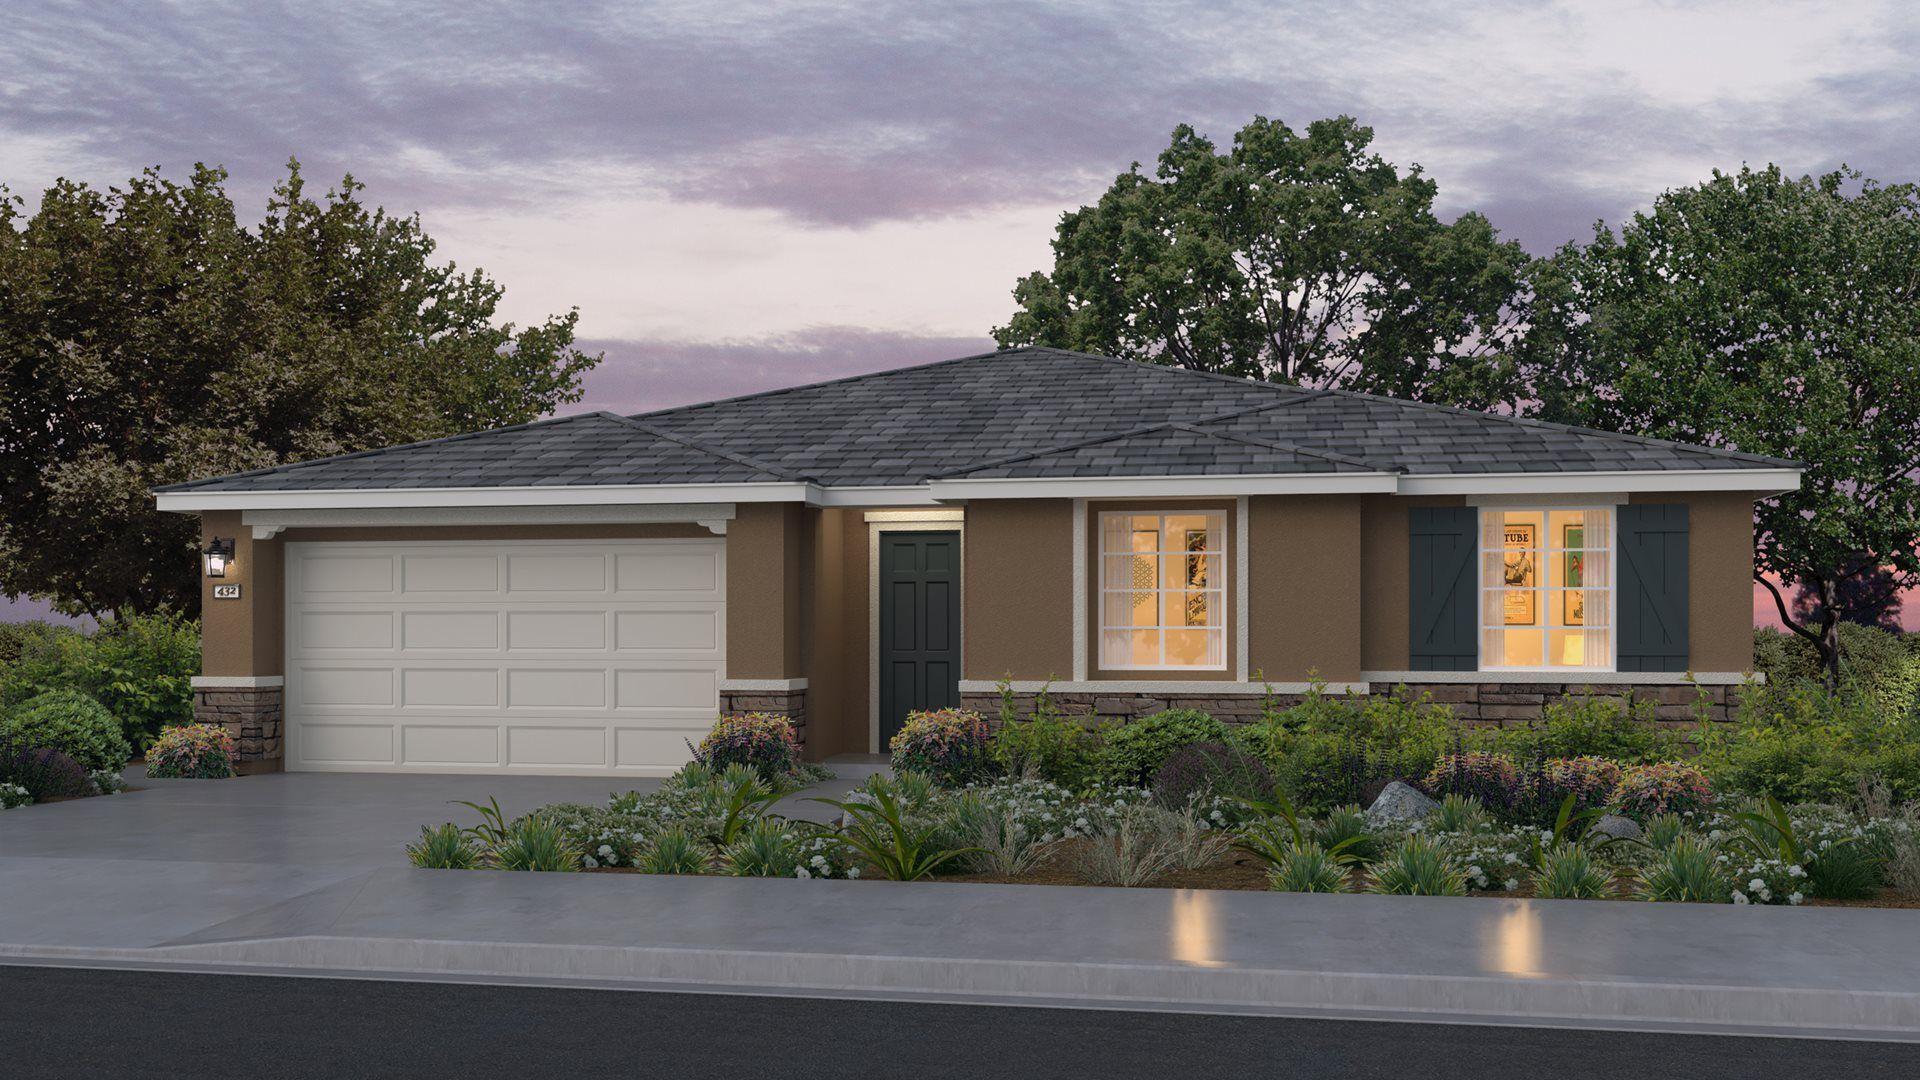 Residence 2362 | Elevation B